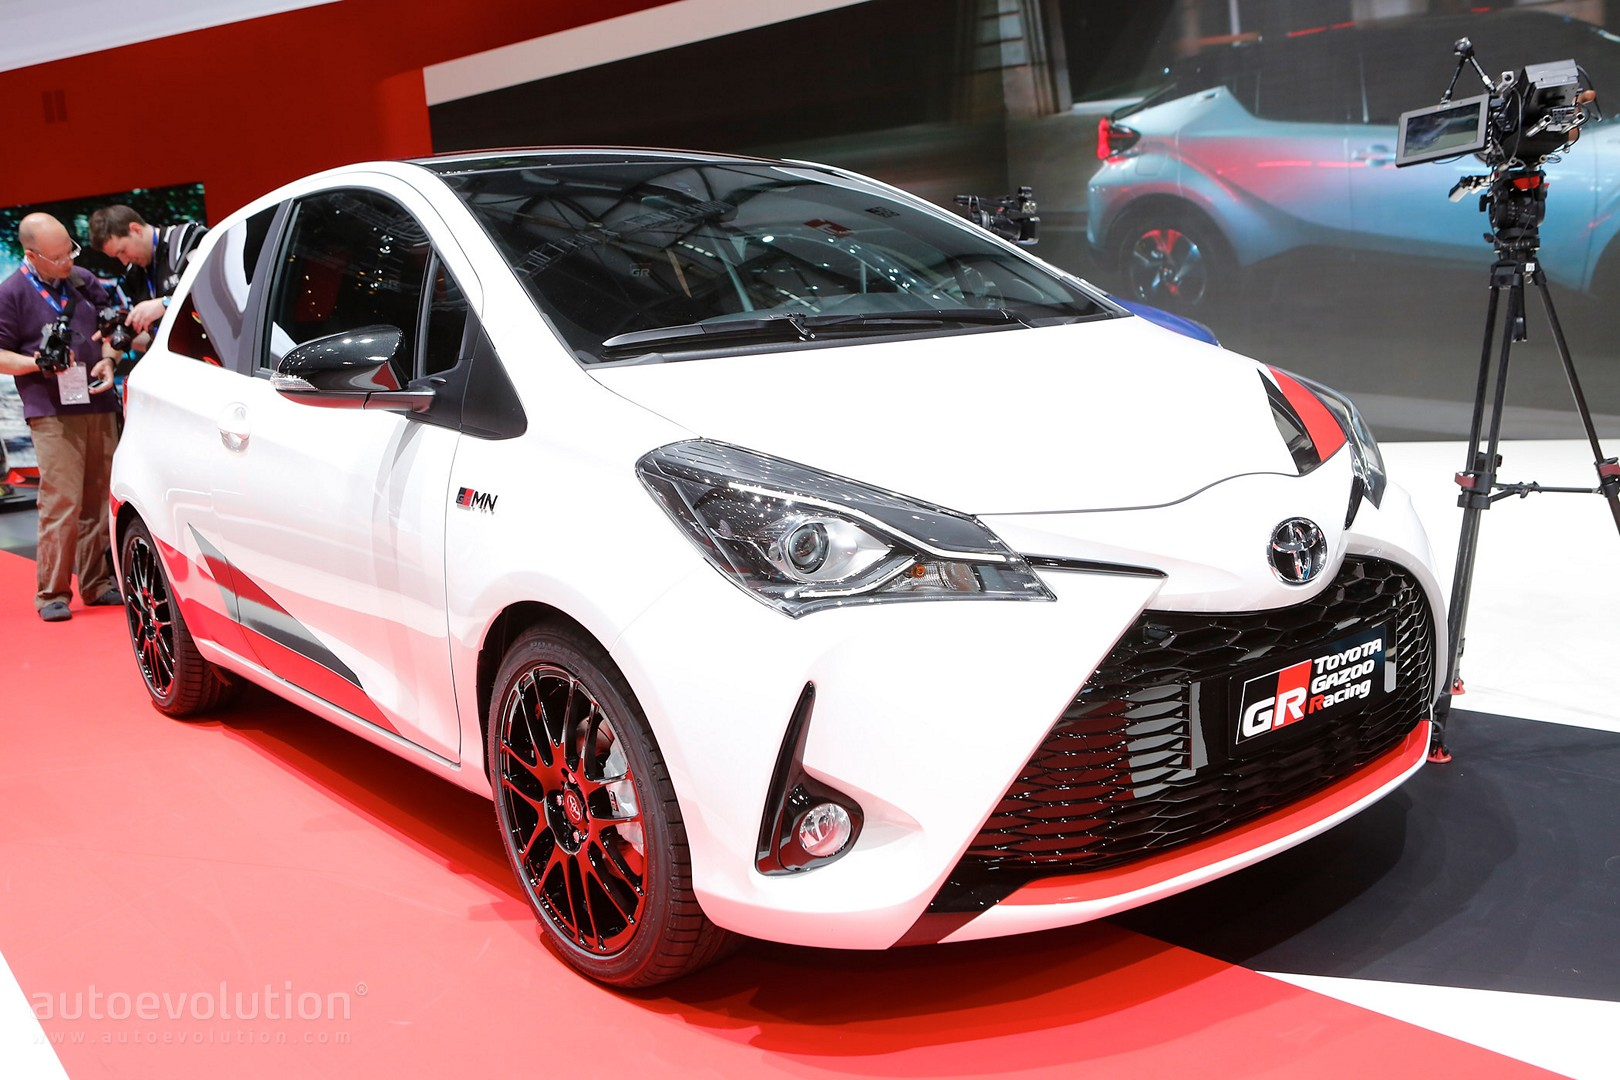 Geneva Motor Show: Hot Toyota Yaris gets supercharged engine